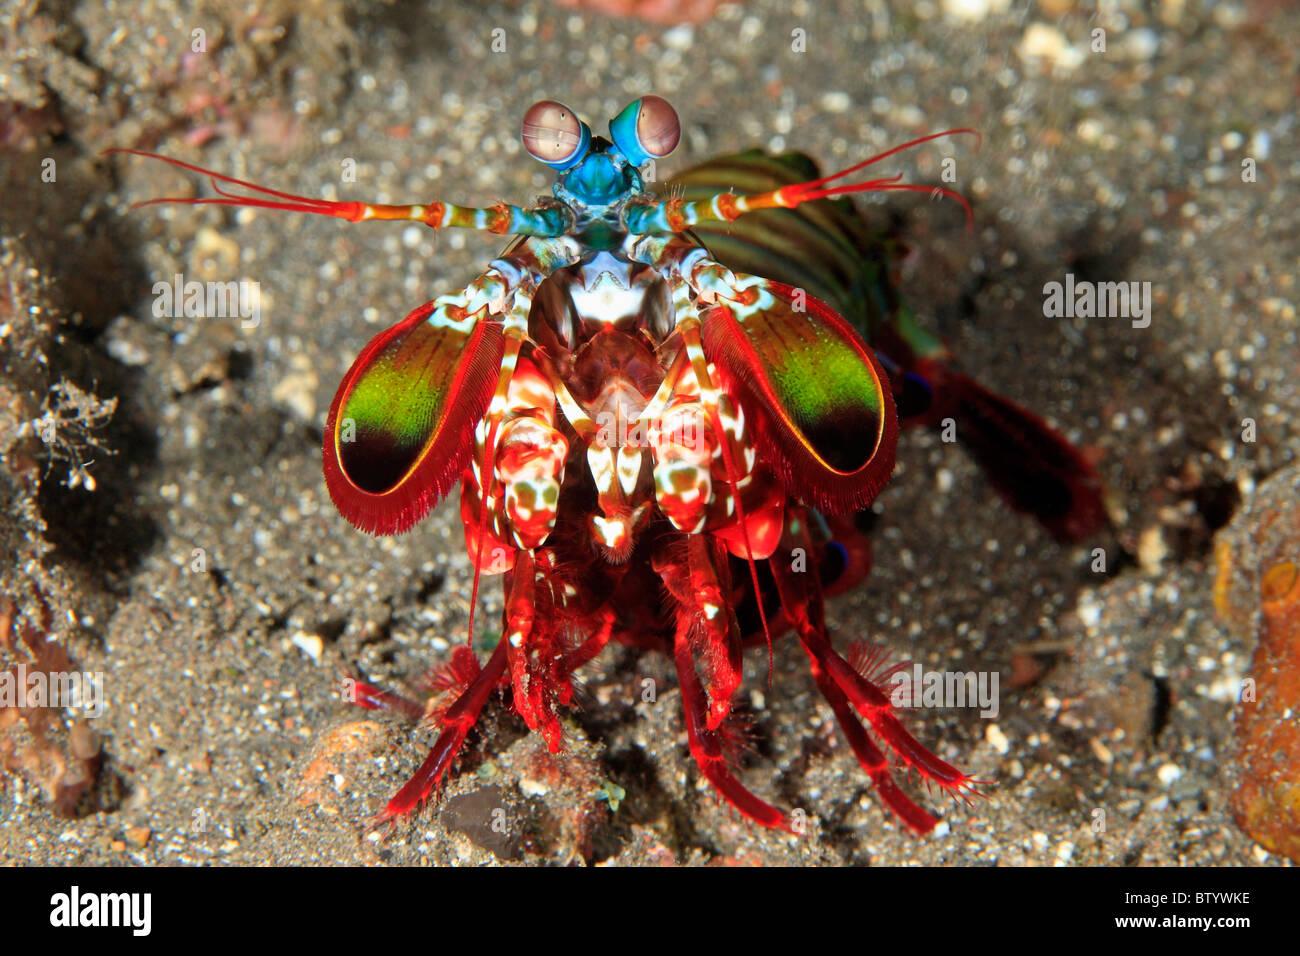 peacock-mantis-shrimp-odontodactylus-scyllarus-also-known-as-a-harlequin-BTYWKE.jpg